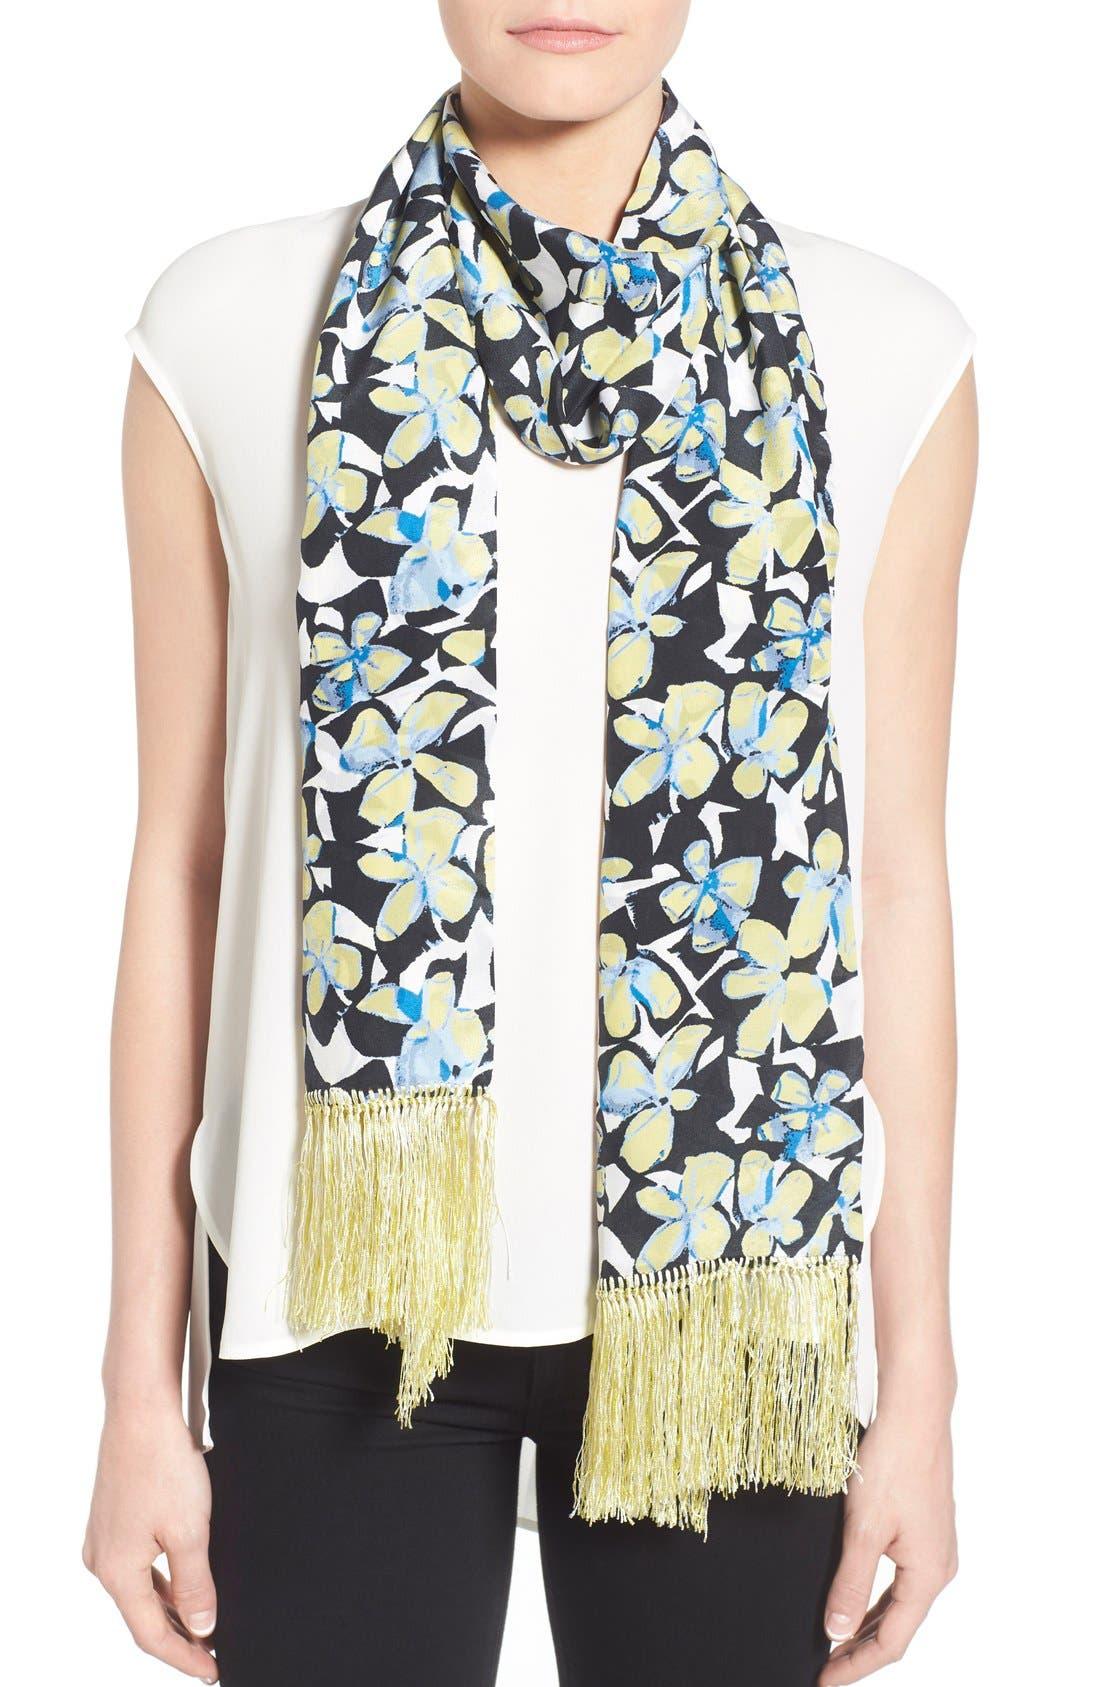 Badgley Mischka Floral Print Fringe Silk Scarf